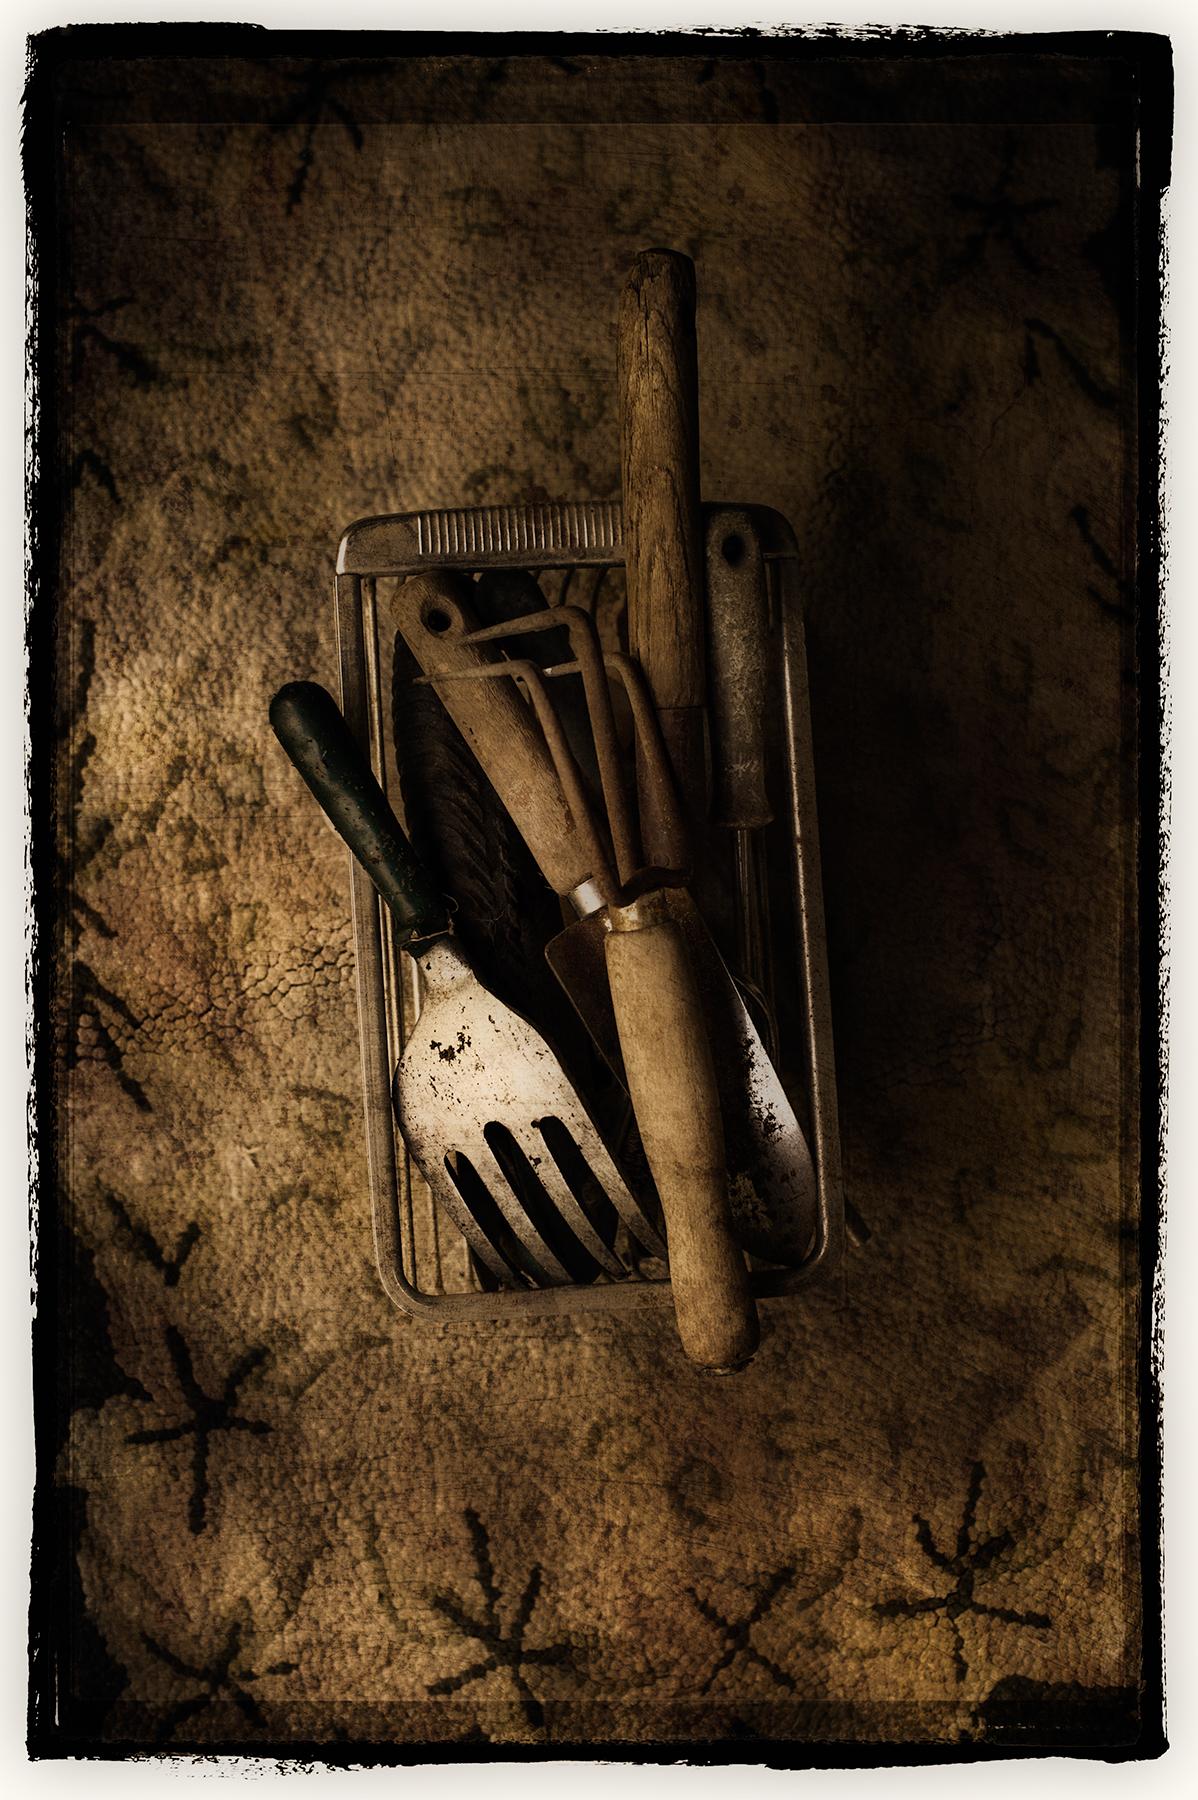 Viki's garden tools